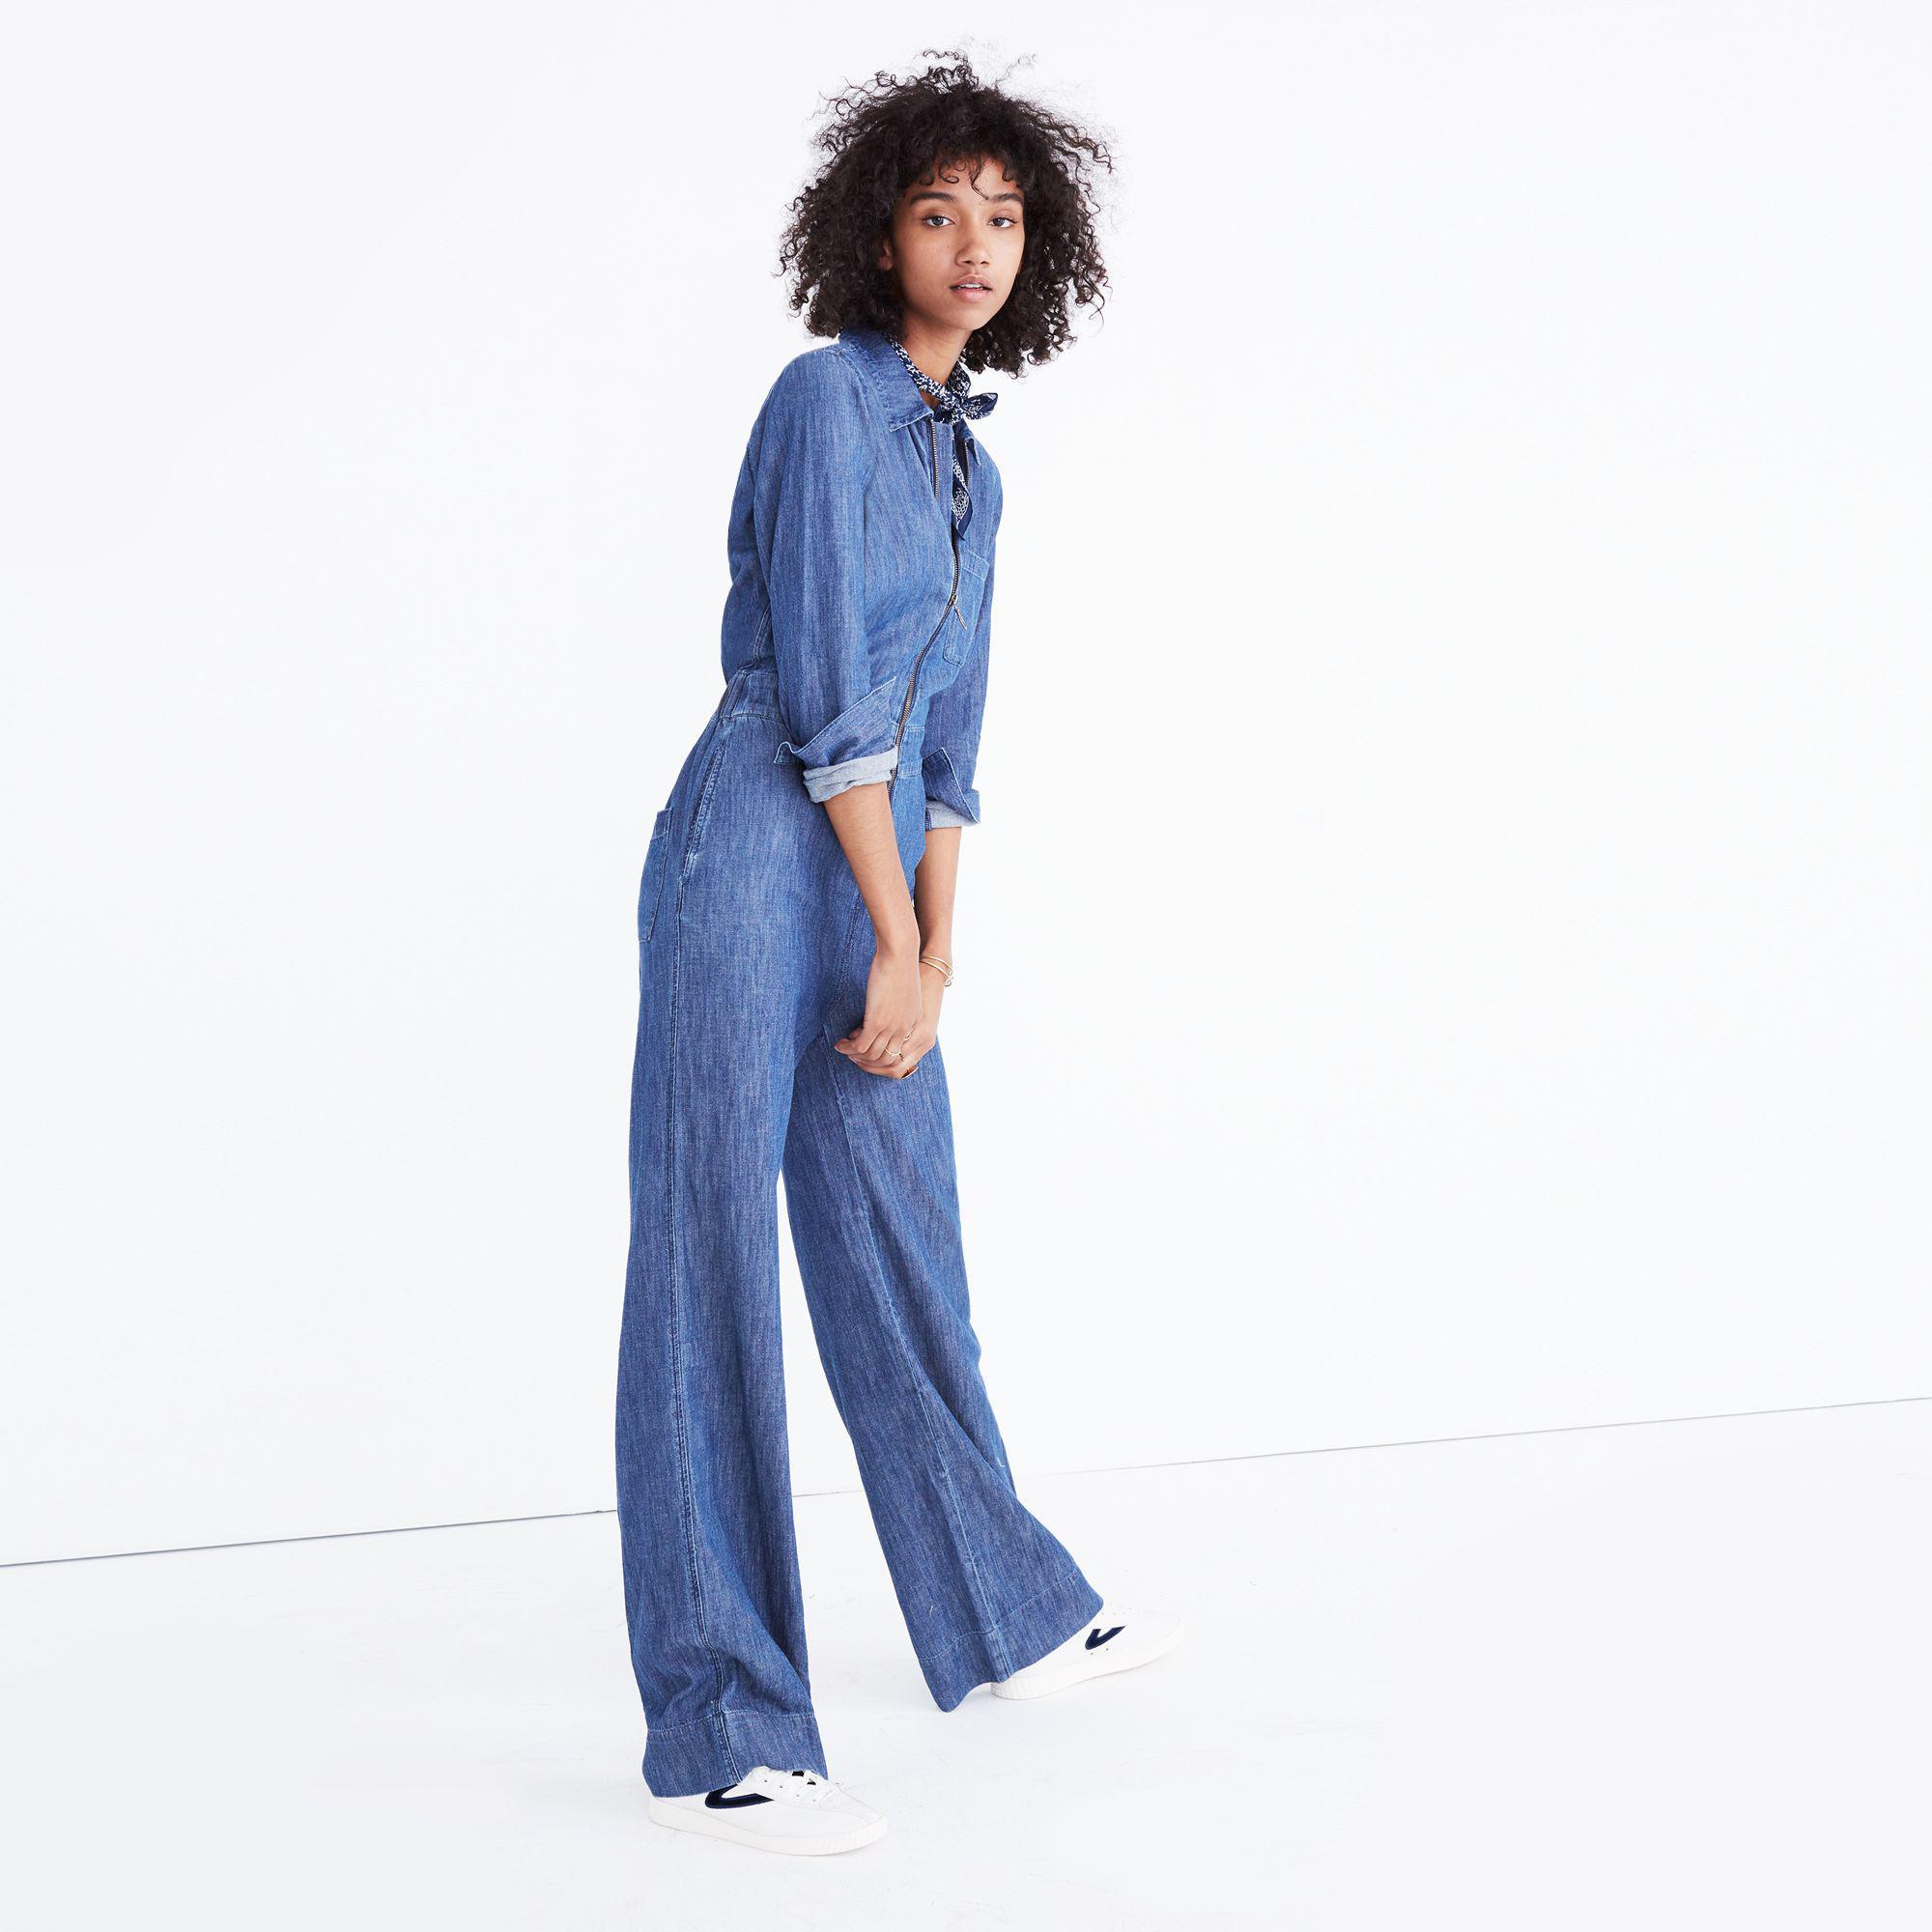 98a82e3fb0 Lyst - Madewell Denim Wide-leg Jumpsuit in Blue